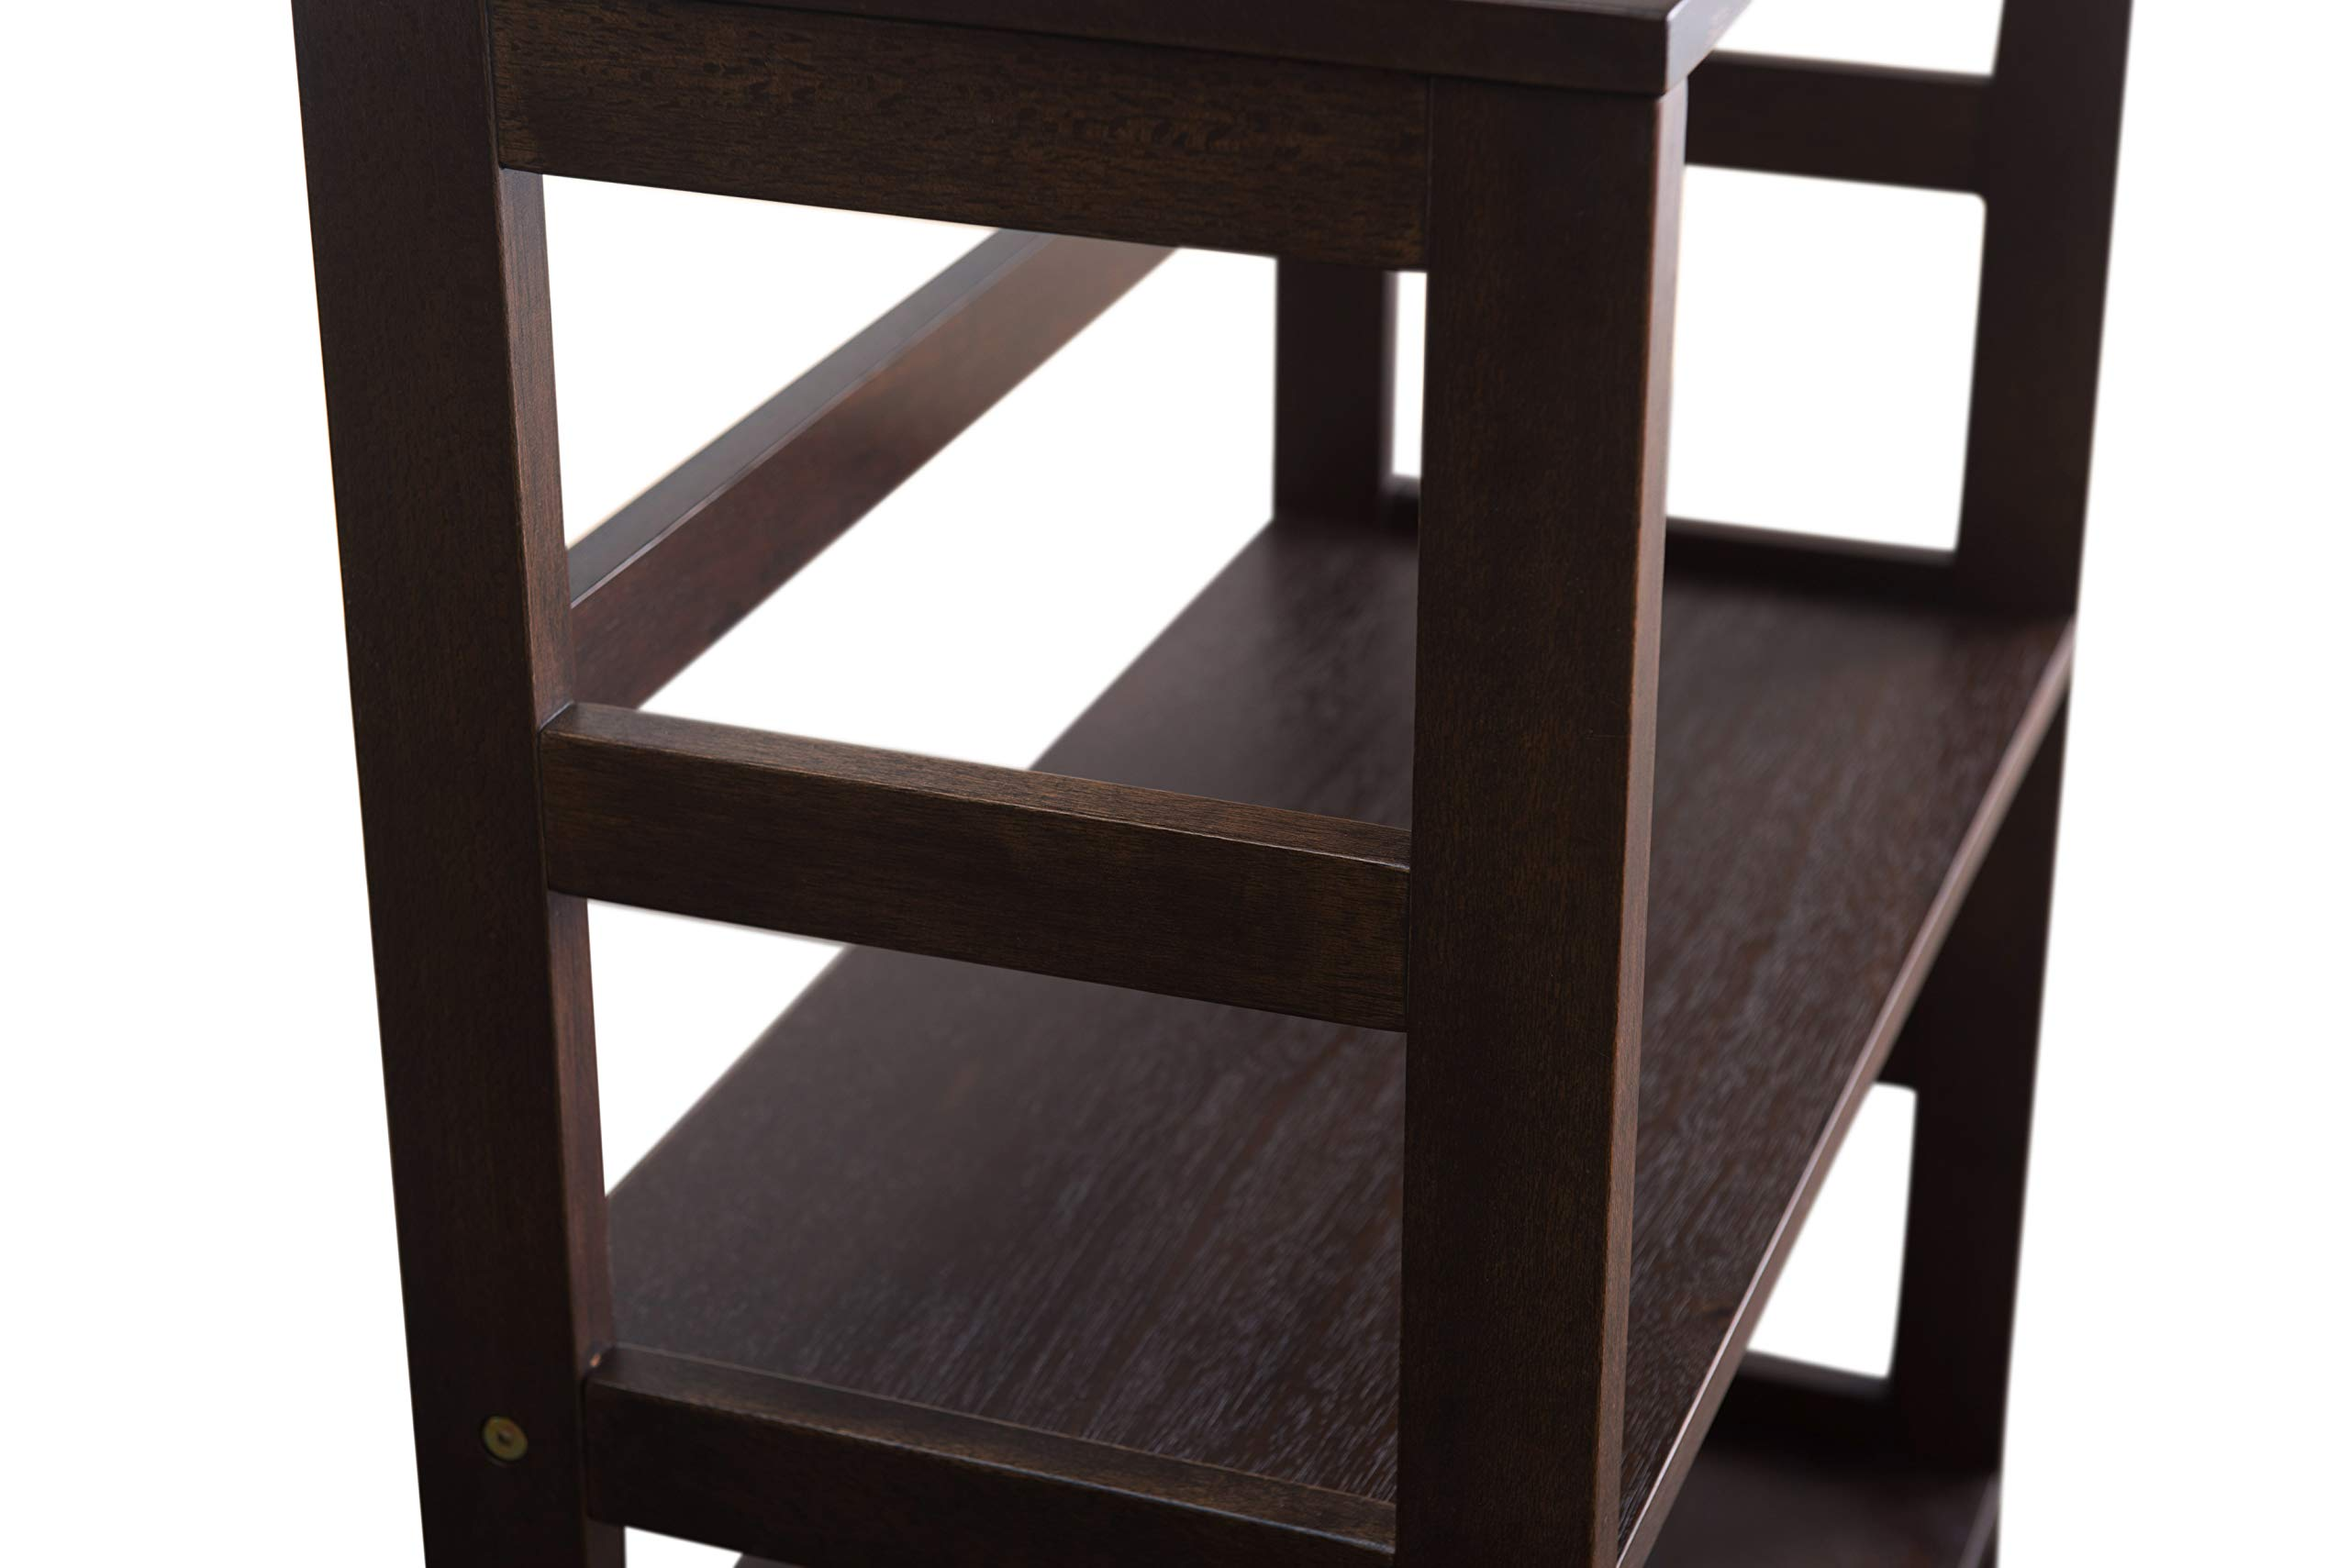 2L Lifestyle Hyder Everyday Basic Bookshelf Storage Rack Wood Shelf, Small, Brown by 2L Lifestyle (Image #8)